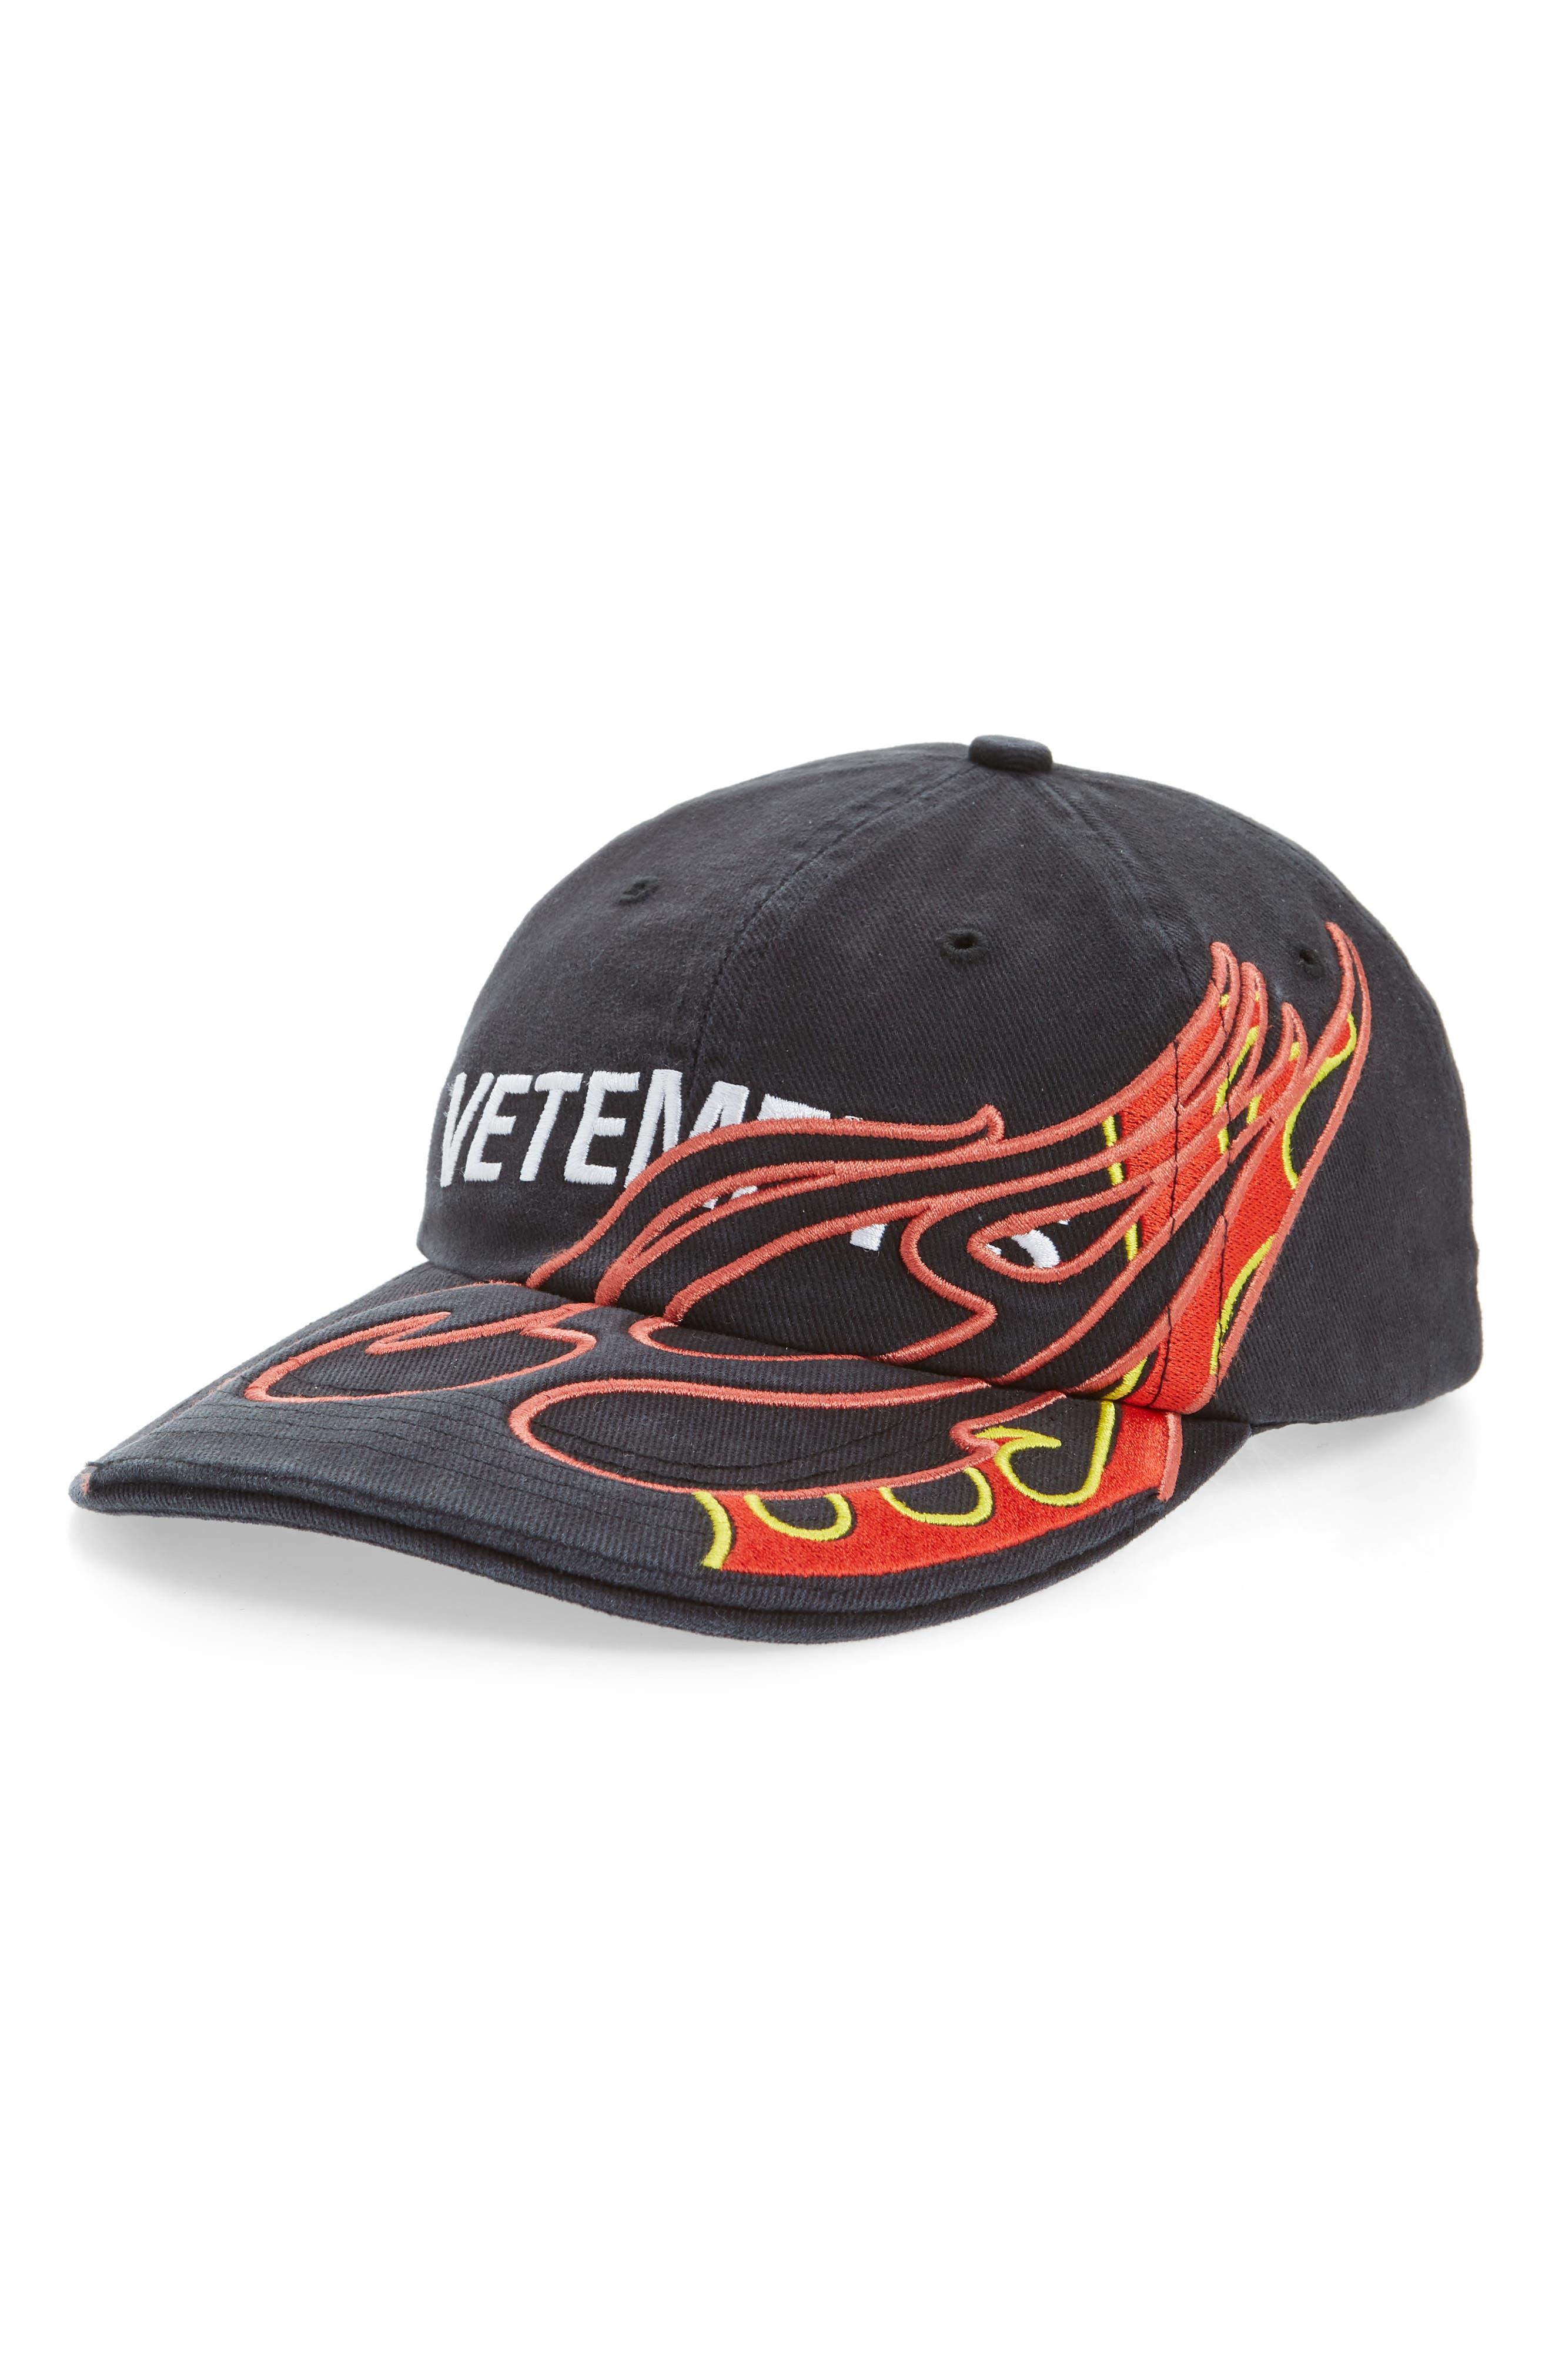 Vetements Accessories Fire Logo Baseball Cap